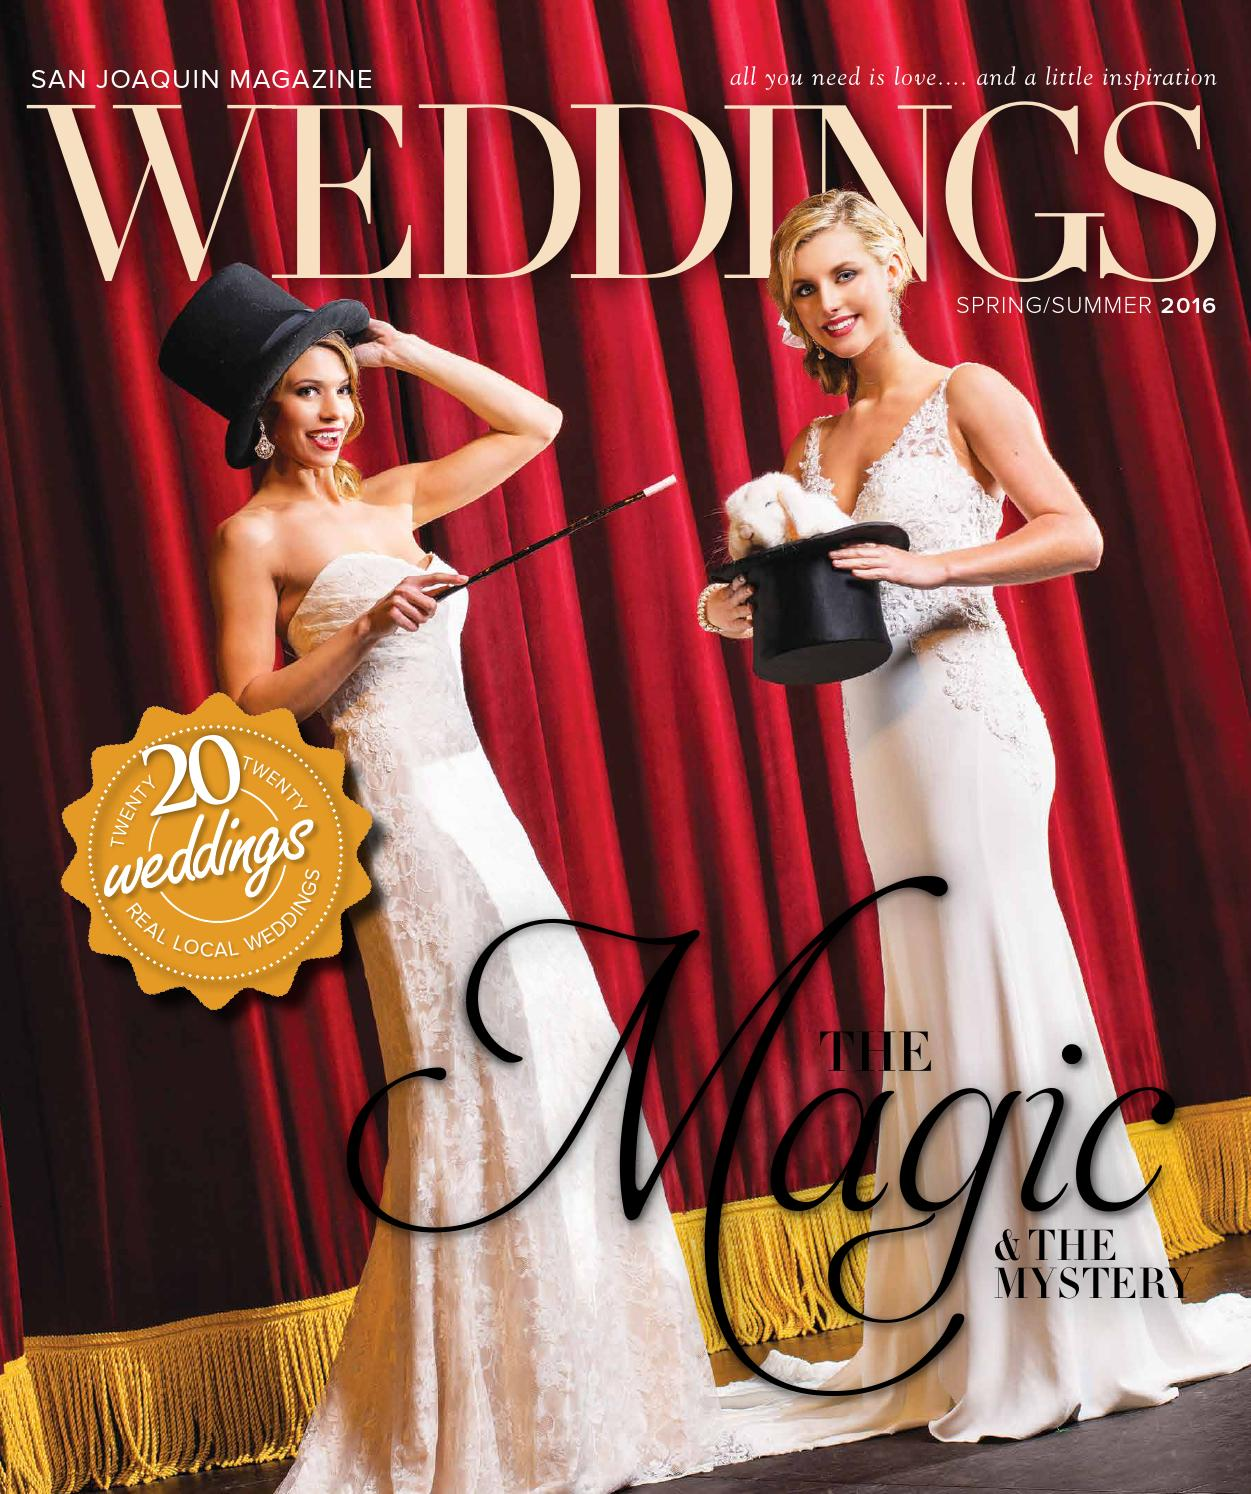 San Joaquin Weddings Spring 2016 By San Joaquin Magazine Issuu